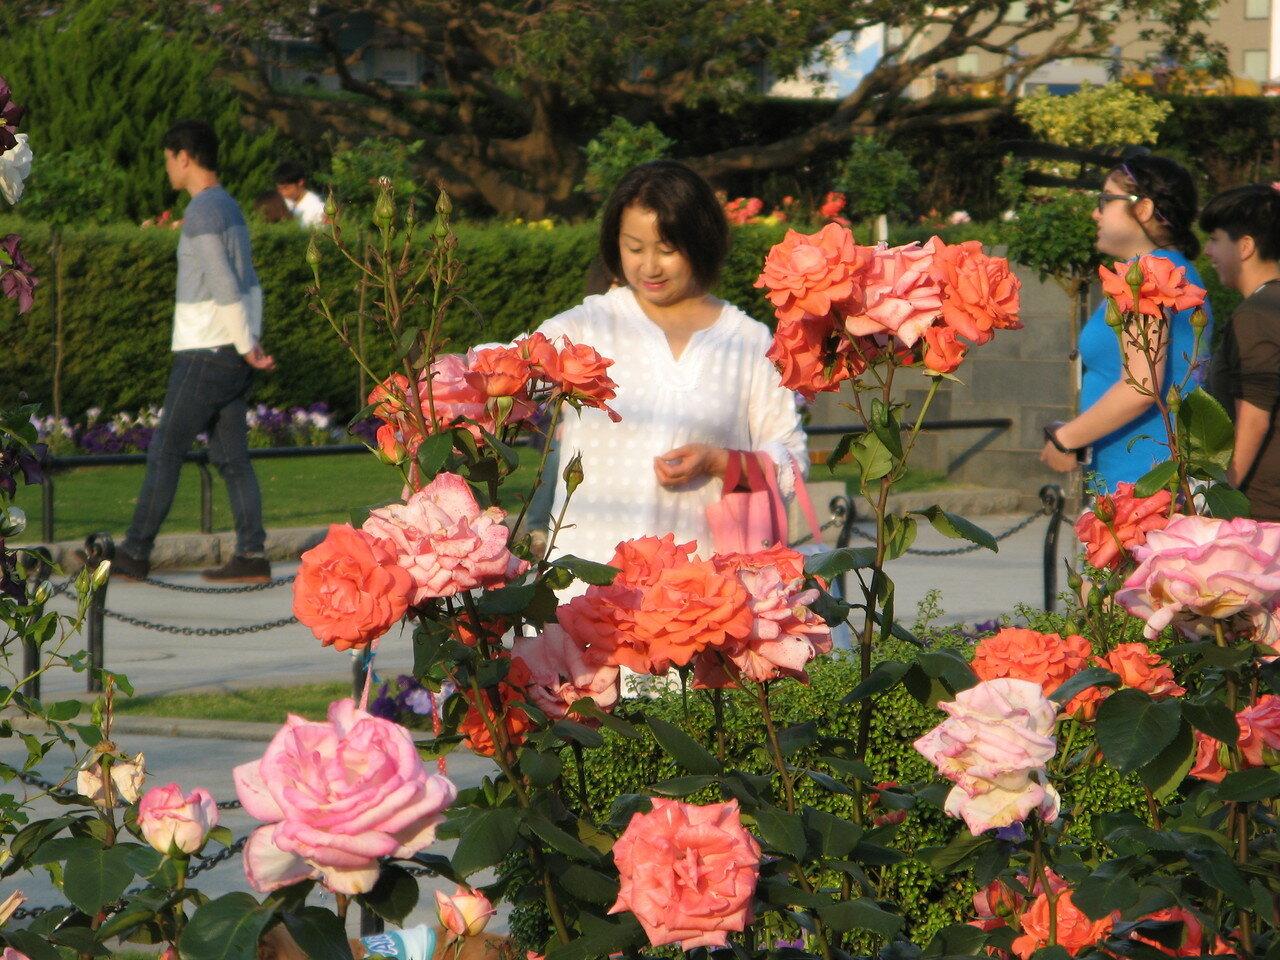 Япония. Сады морского парка Ямасита коэн в городе Йокогама